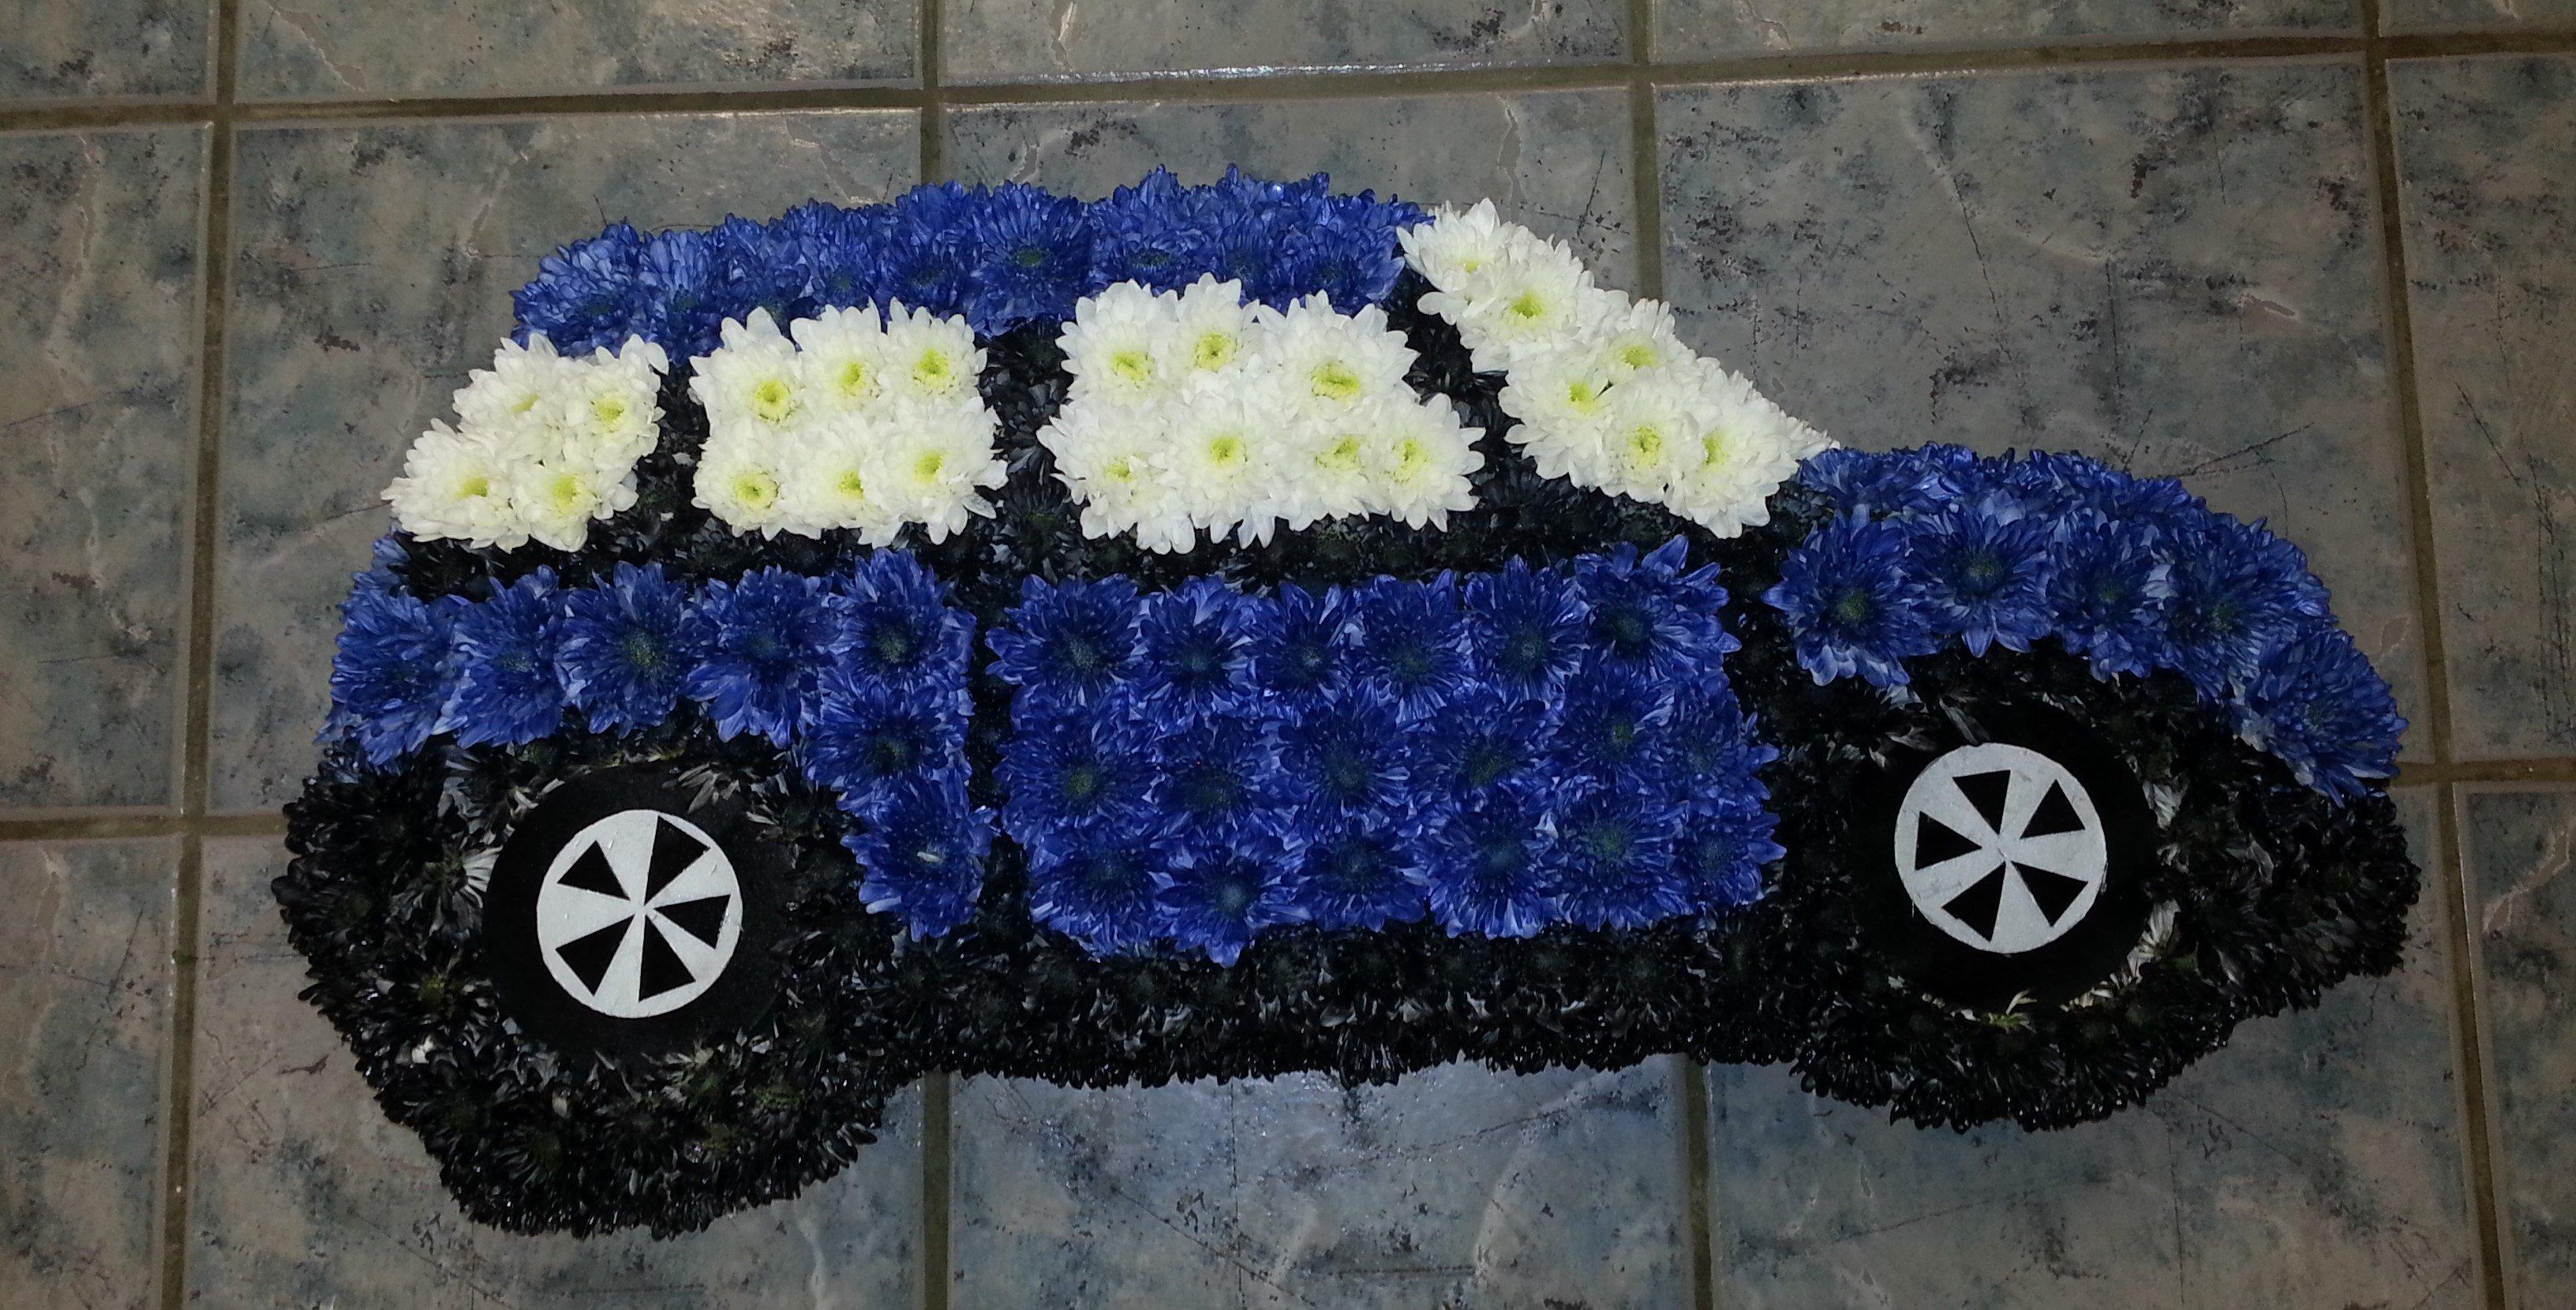 Car funeral flowers choice image flower wallpaper hd car funeral flowers gallery flower wallpaper hd car funeral flowers images flower wallpaper hd car funeral izmirmasajfo